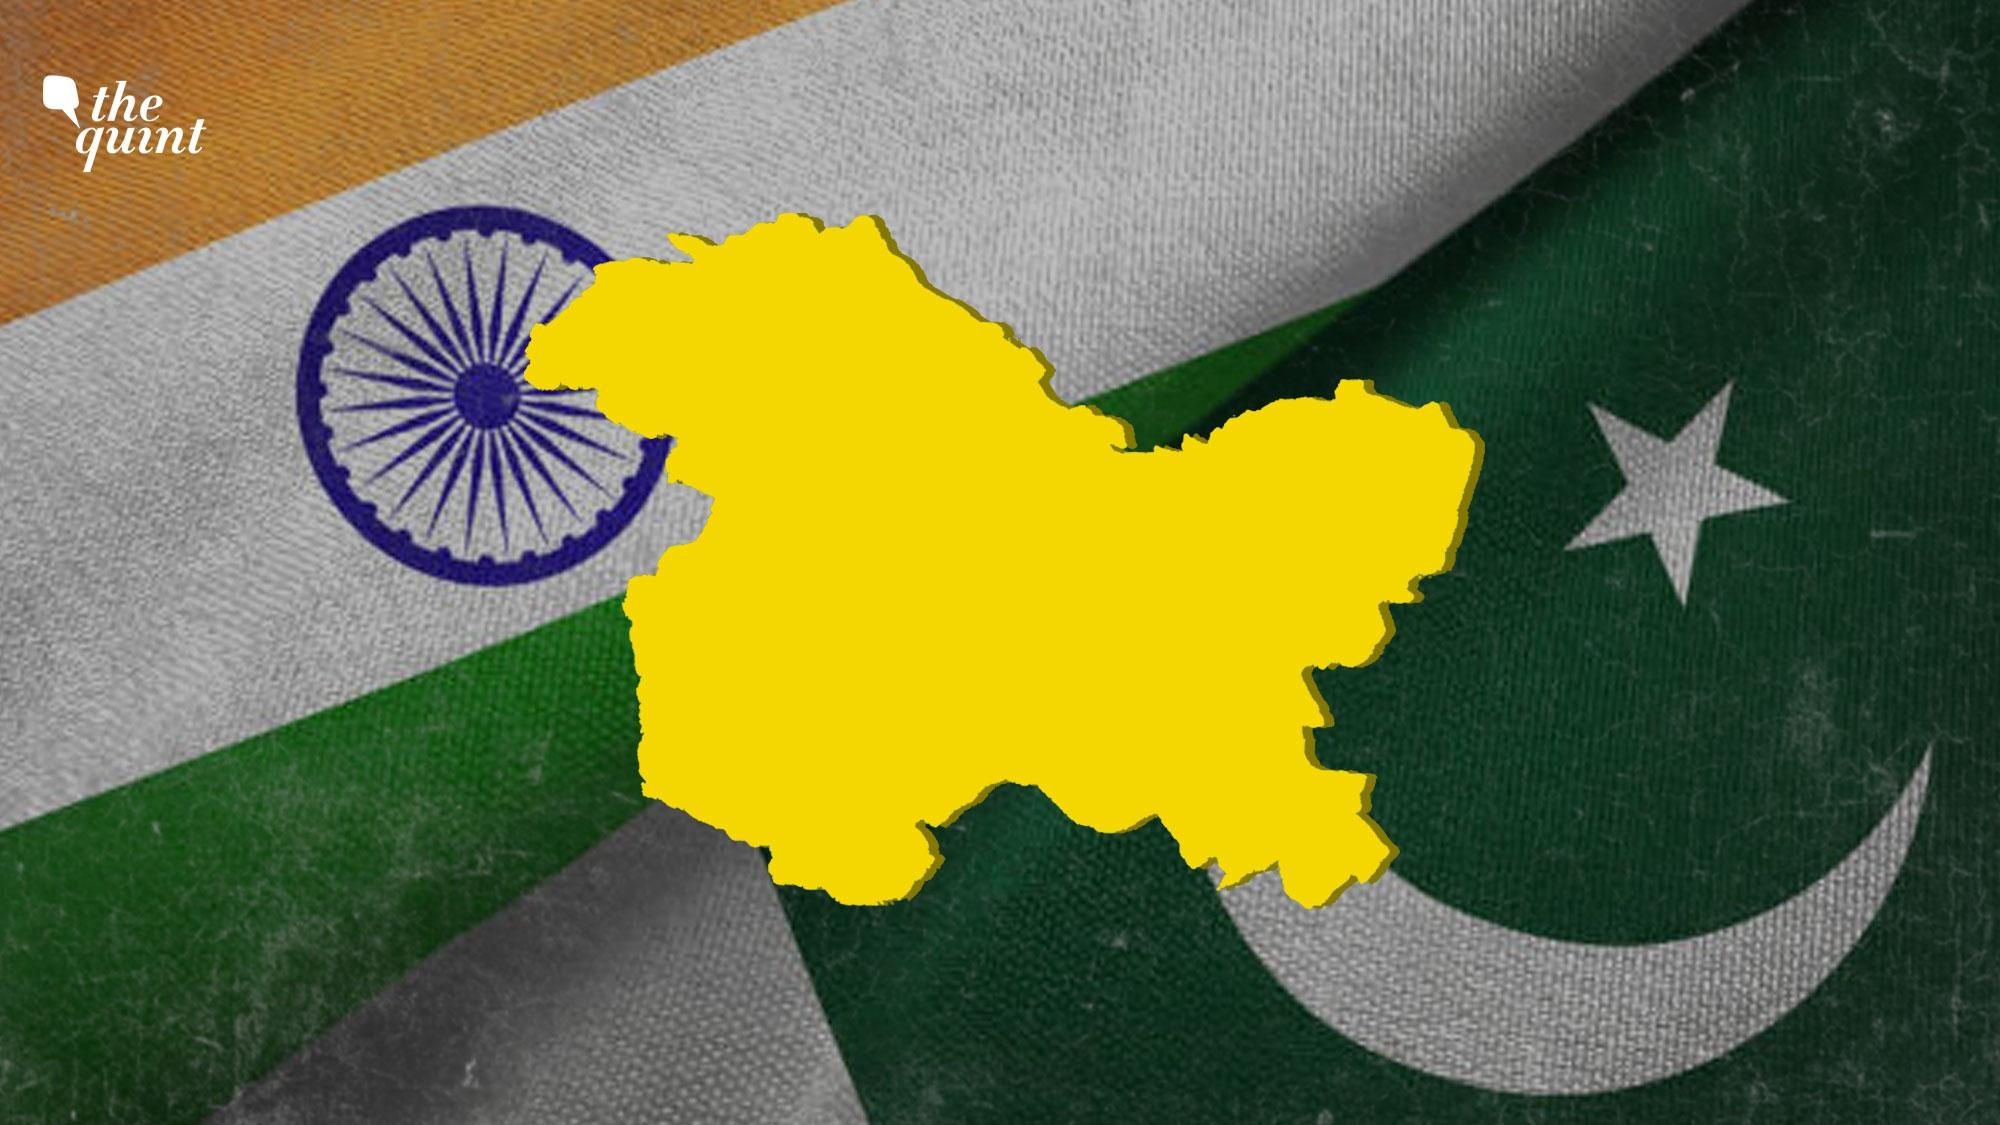 Pakistan 'Spews Venom', Takes to Hate Speech: India at UN